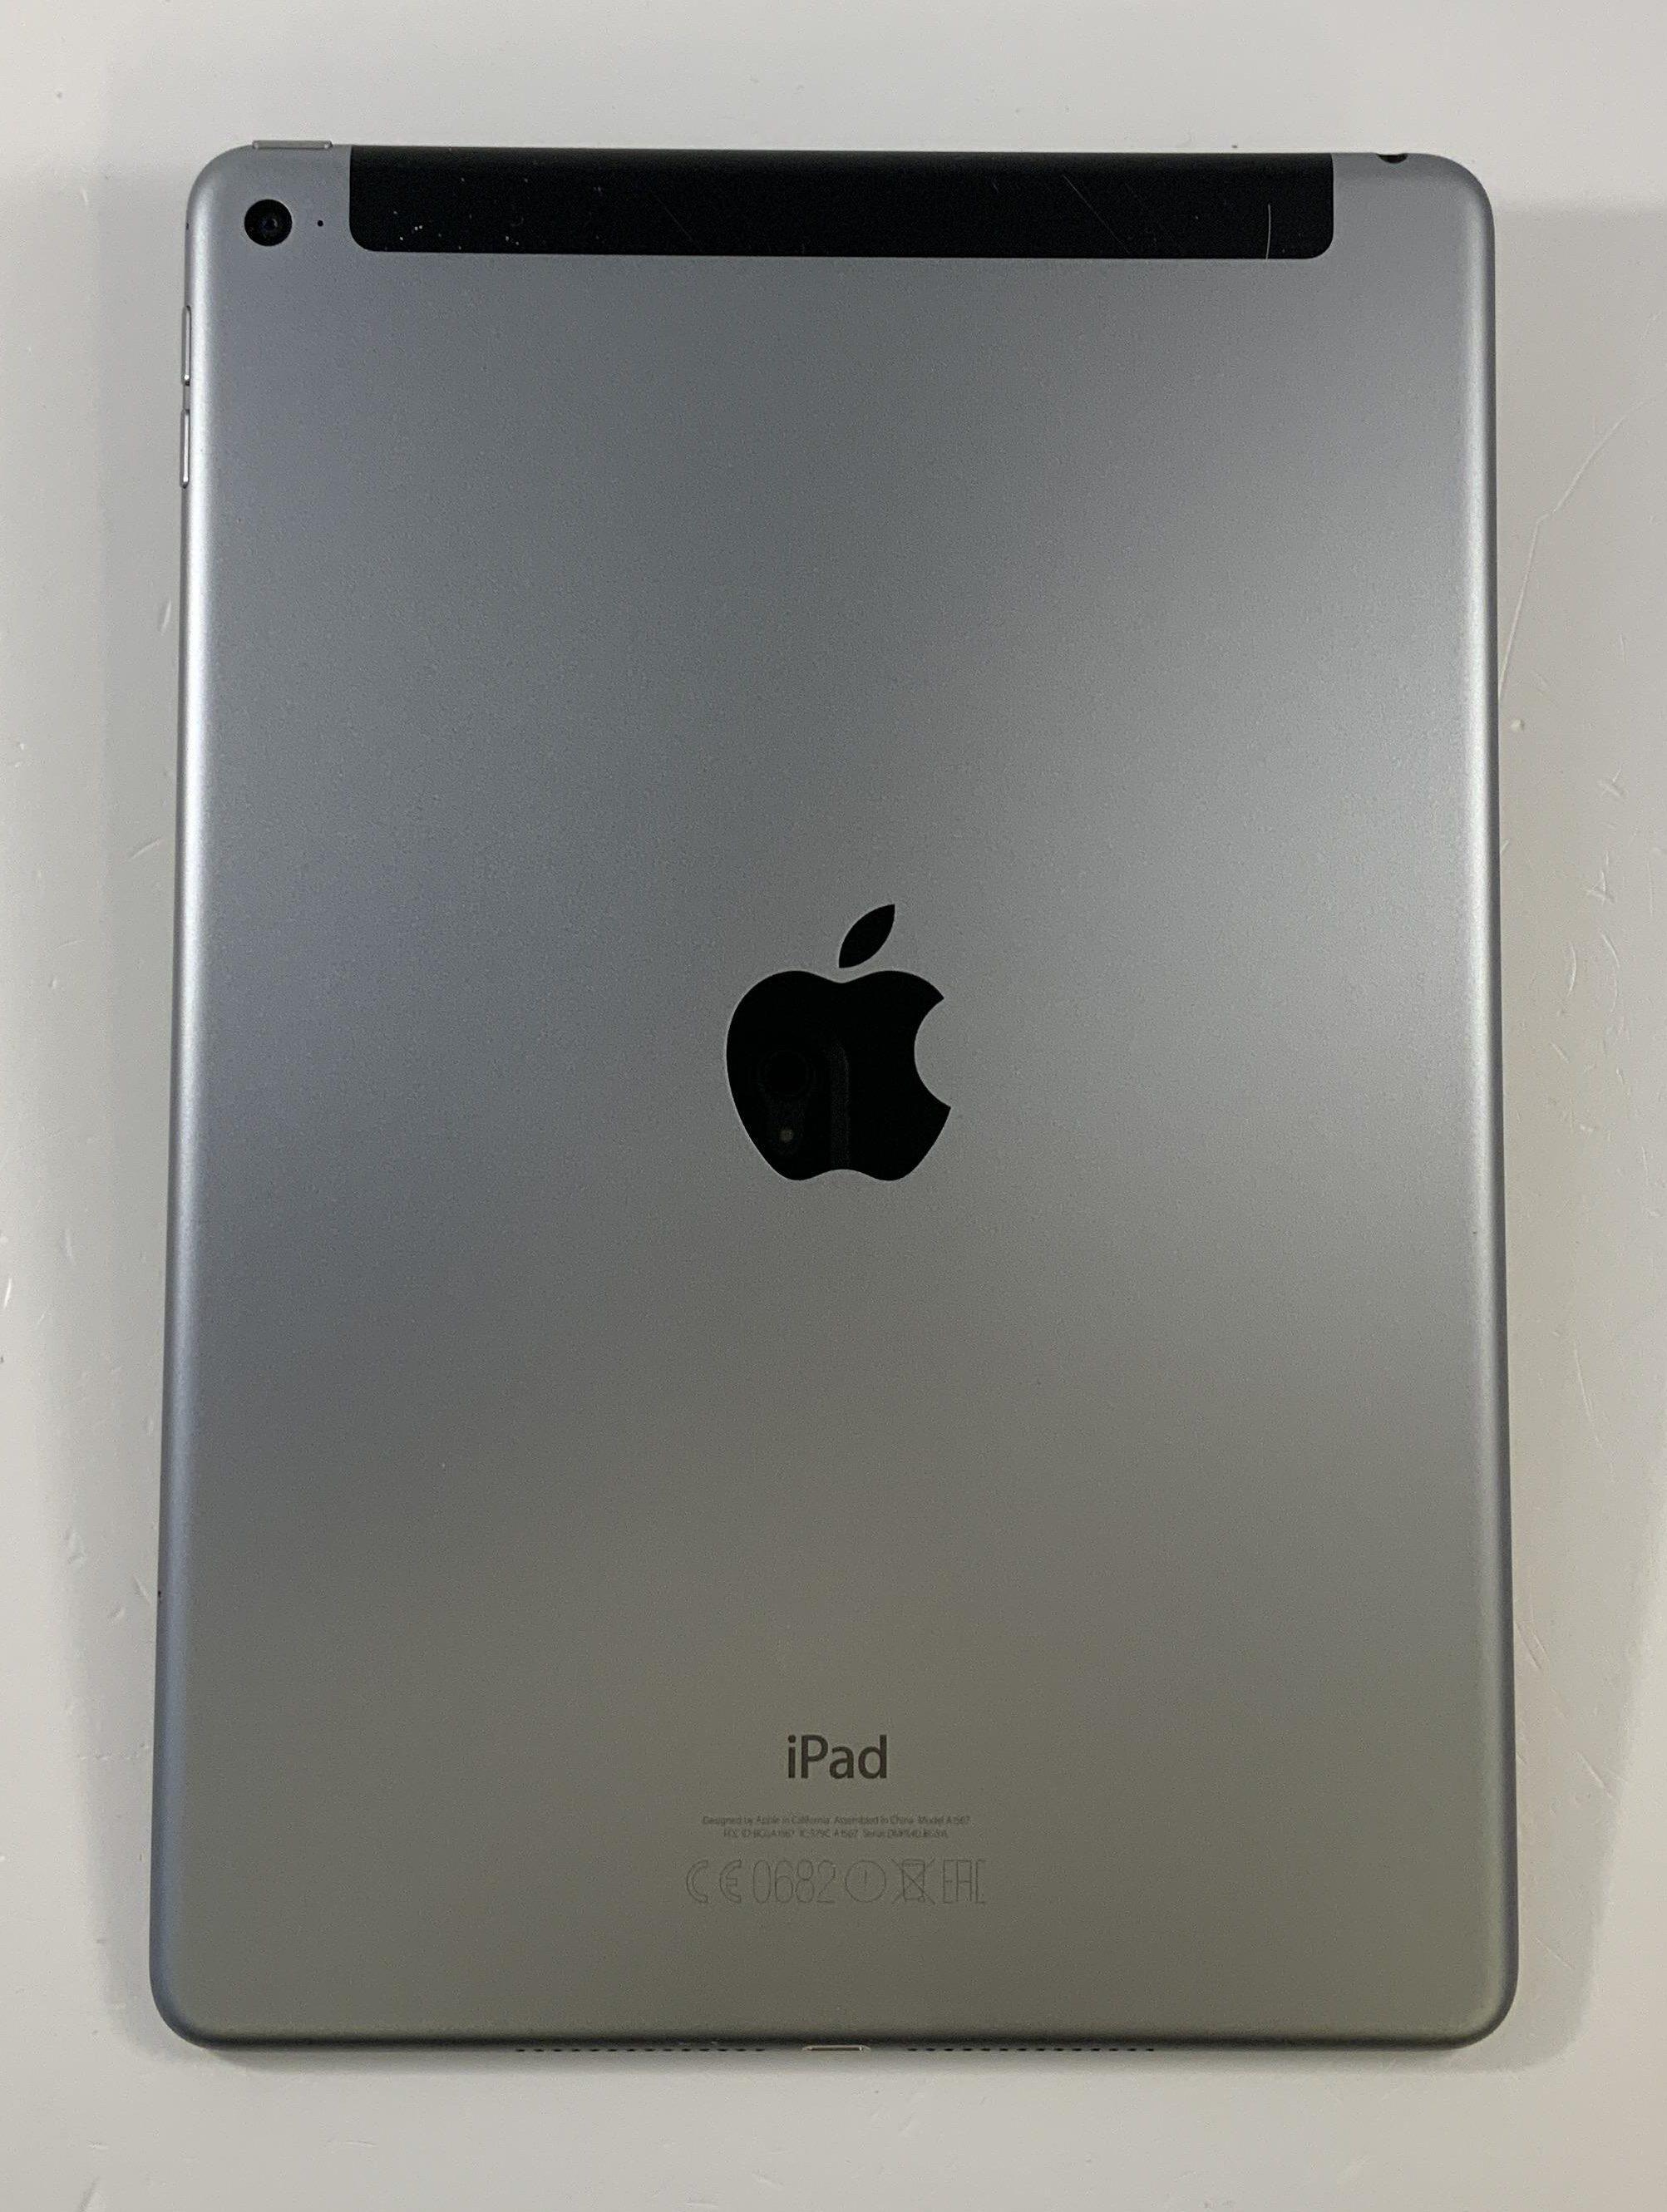 iPad Air 2 Wi-Fi + Cellular 64GB, 64GB, Space Gray, immagine 2